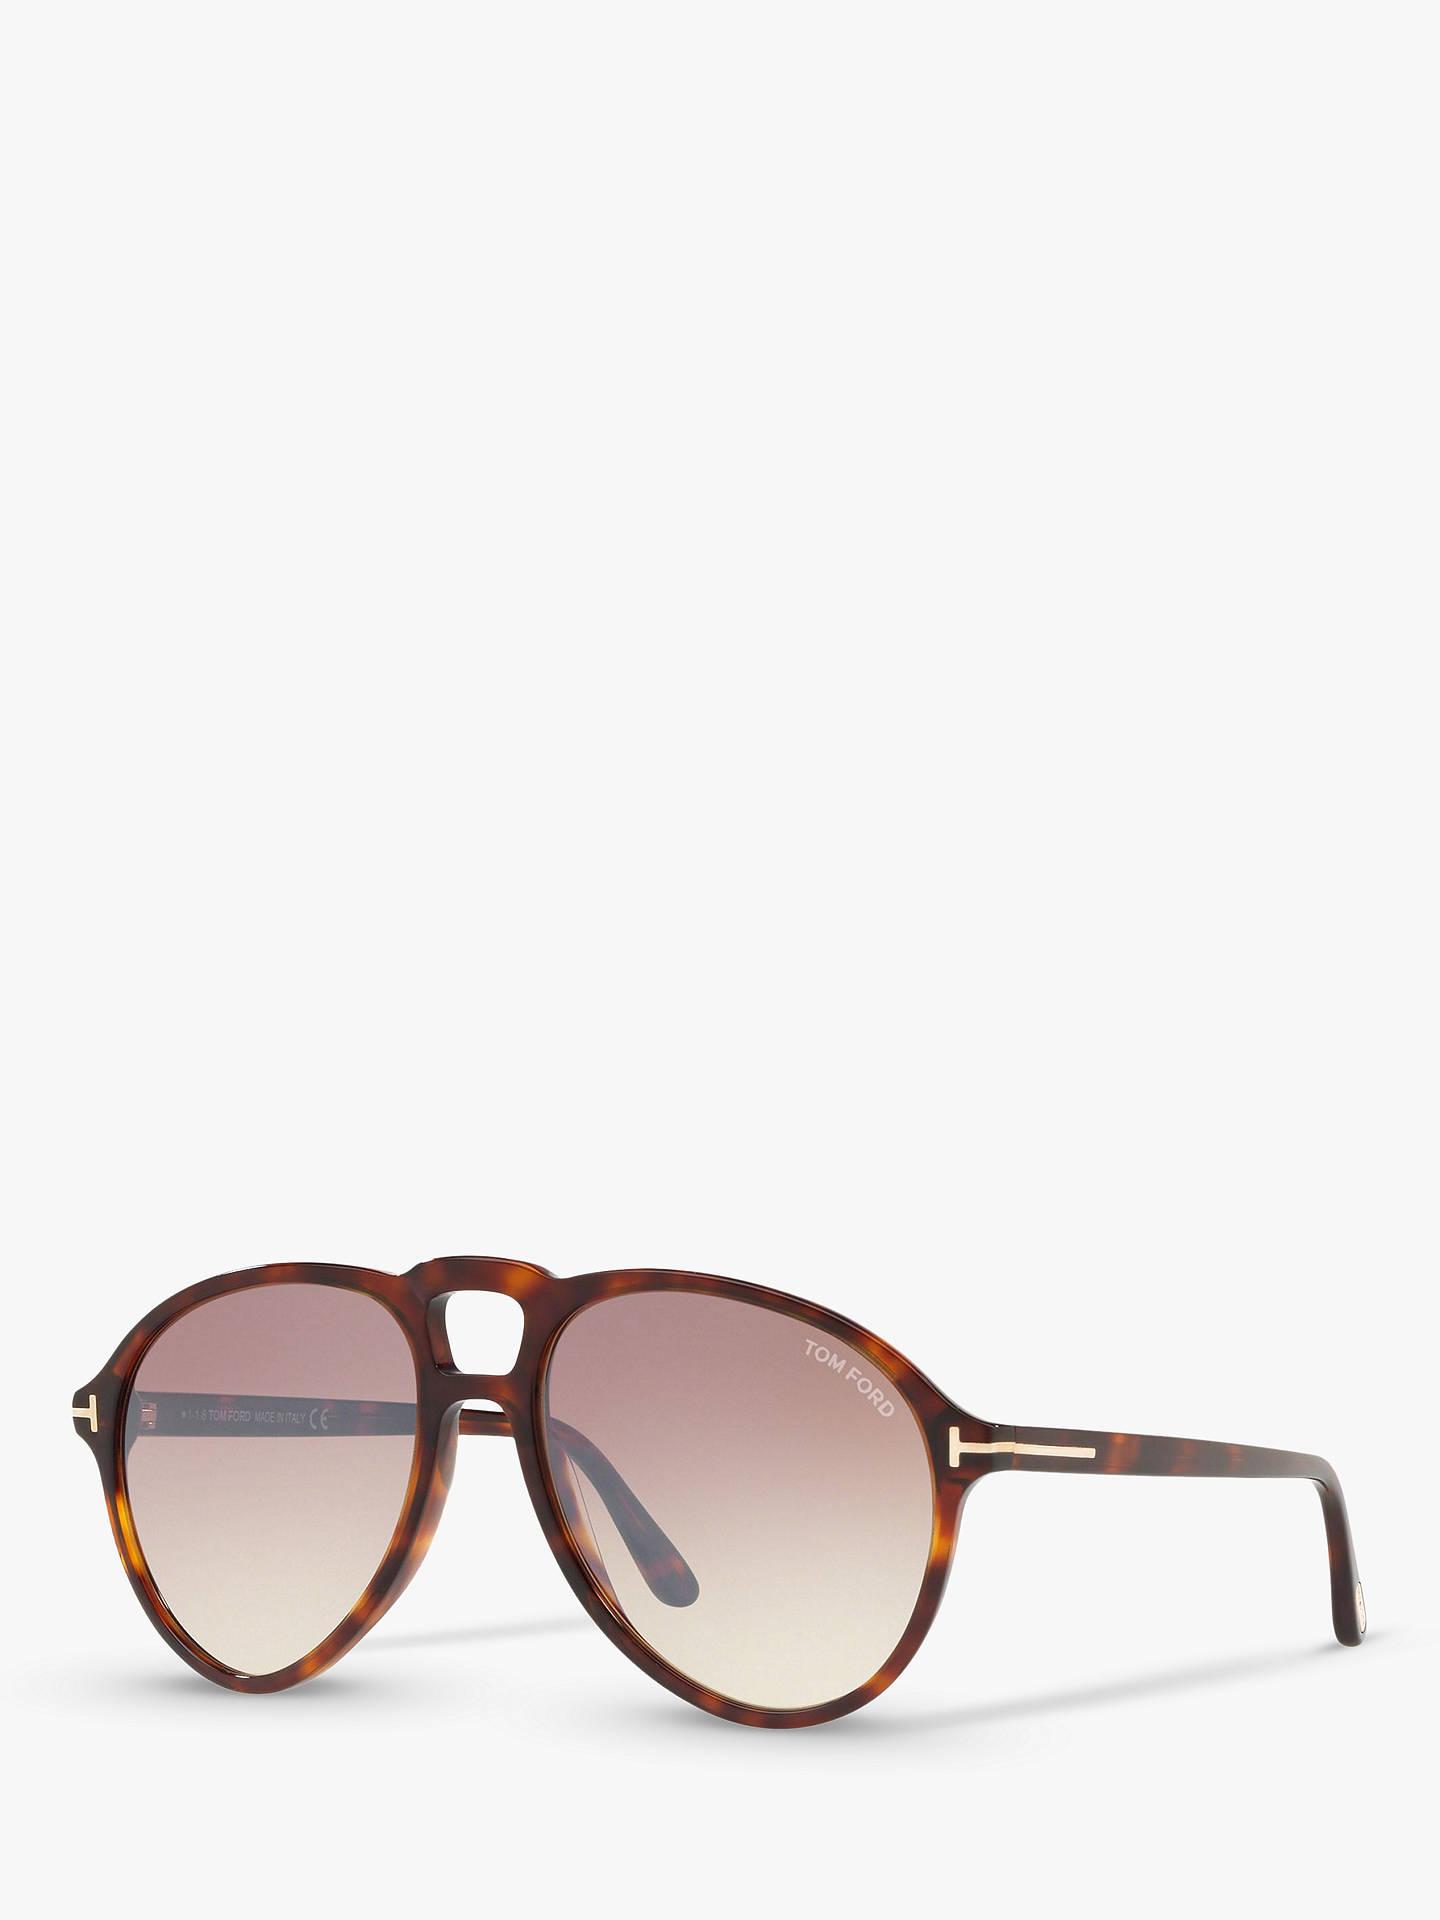 dfa4406b4868 TOM FORD FT0645 Men s Lennon Aviator Sunglasses at John Lewis   Partners